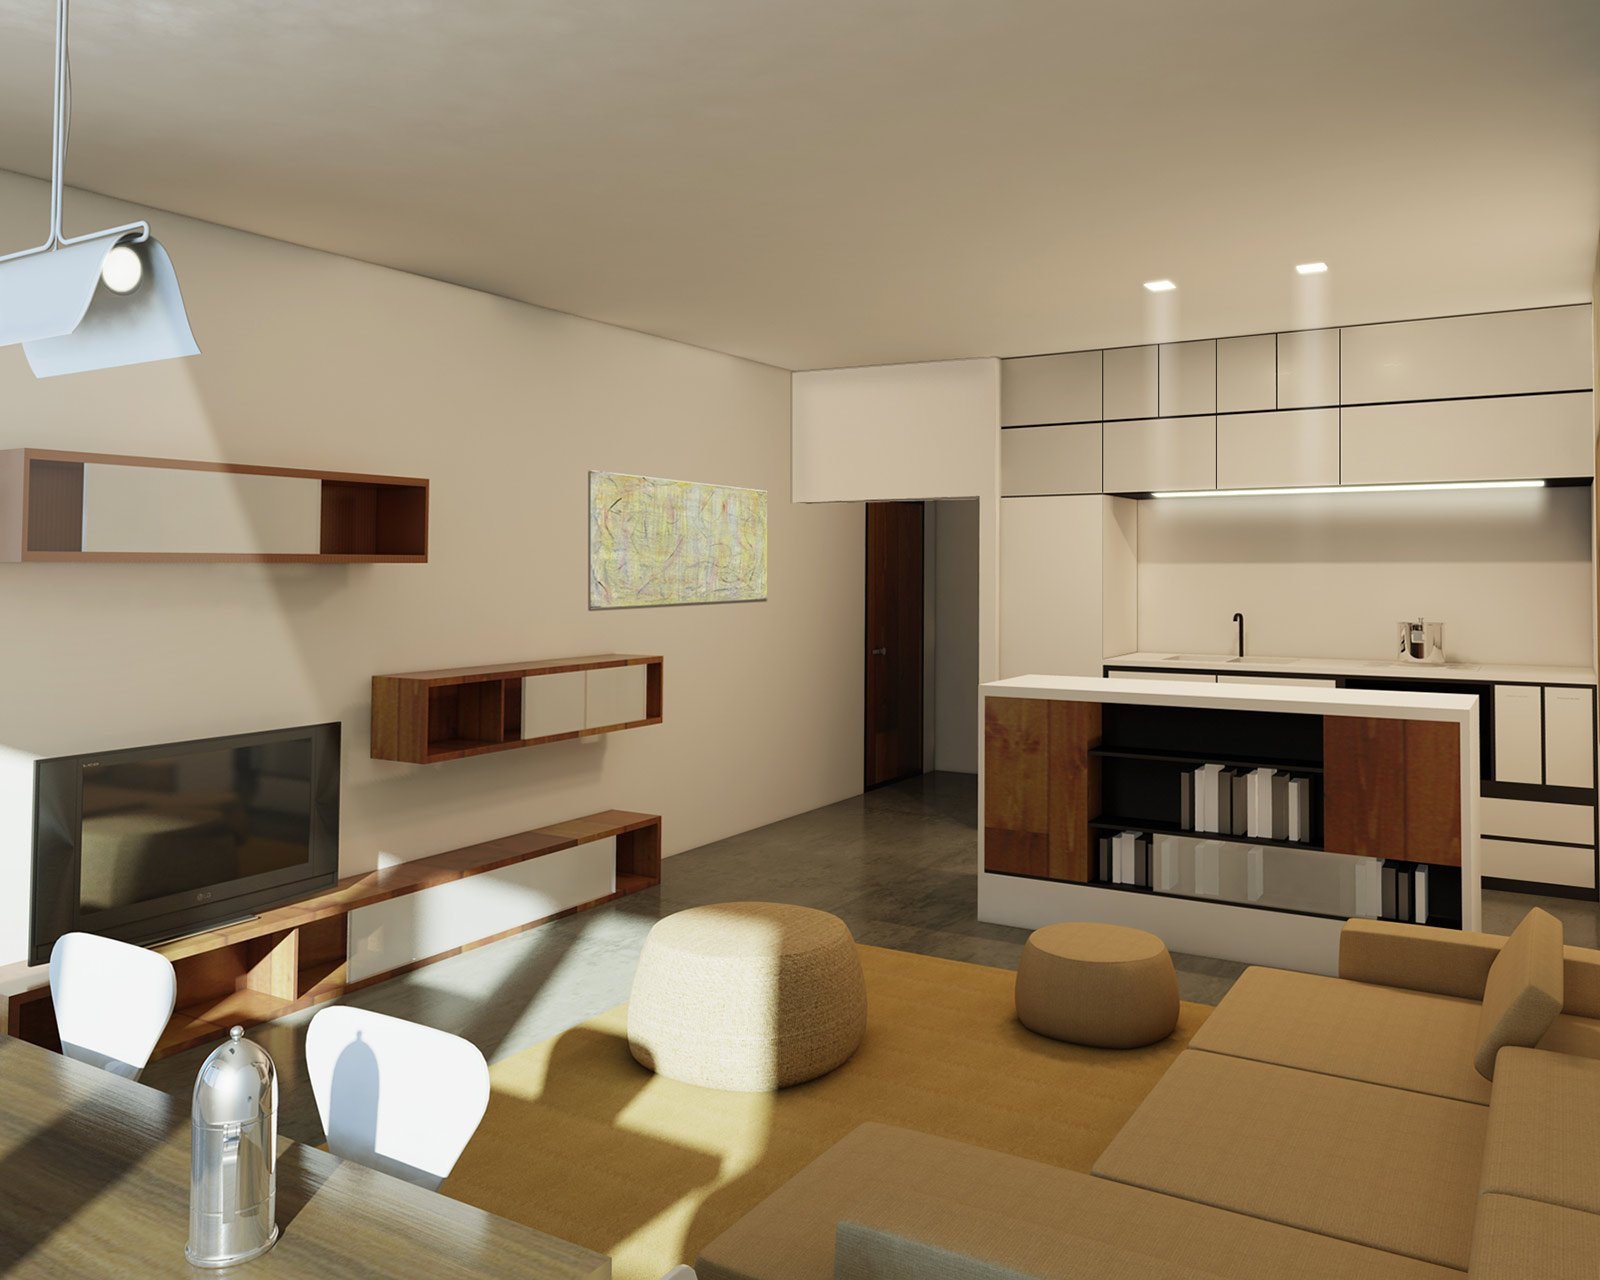 Idee Arredamento Terrazzo : Idee arredo terrazzo fai da te. Idee ...